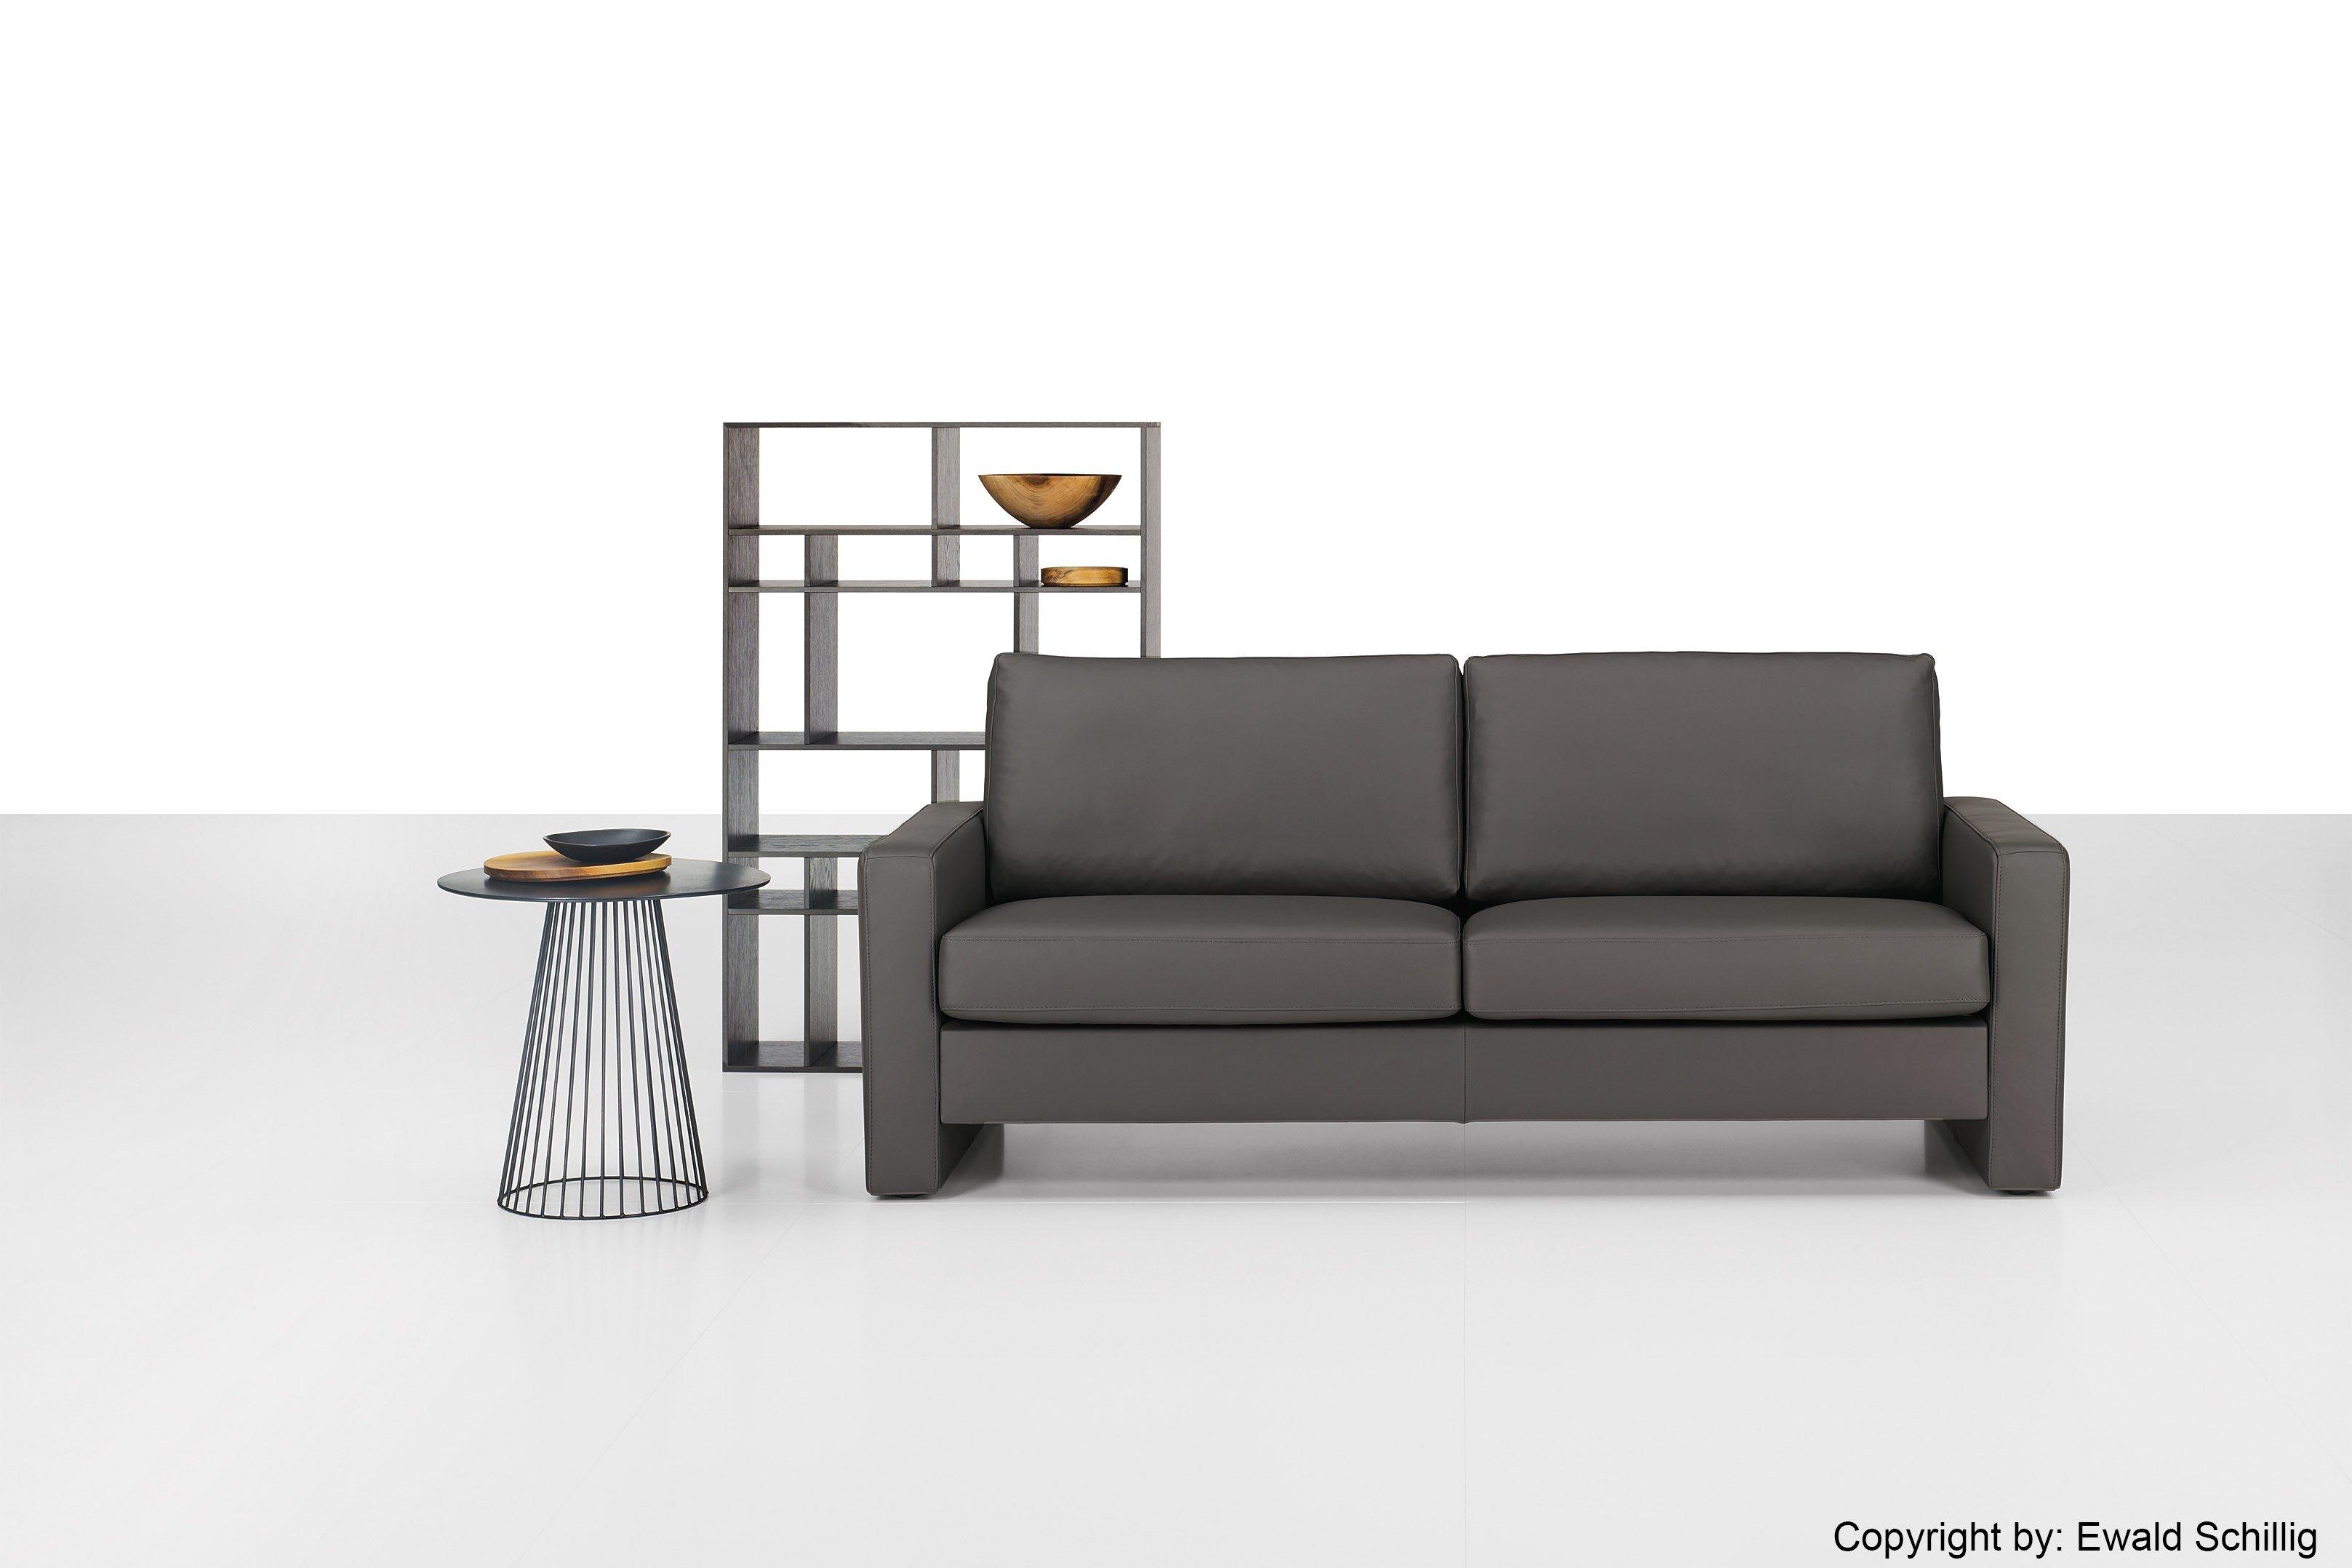 beste ewald schilling polsterm bel bilder die kinderzimmer design ideen. Black Bedroom Furniture Sets. Home Design Ideas